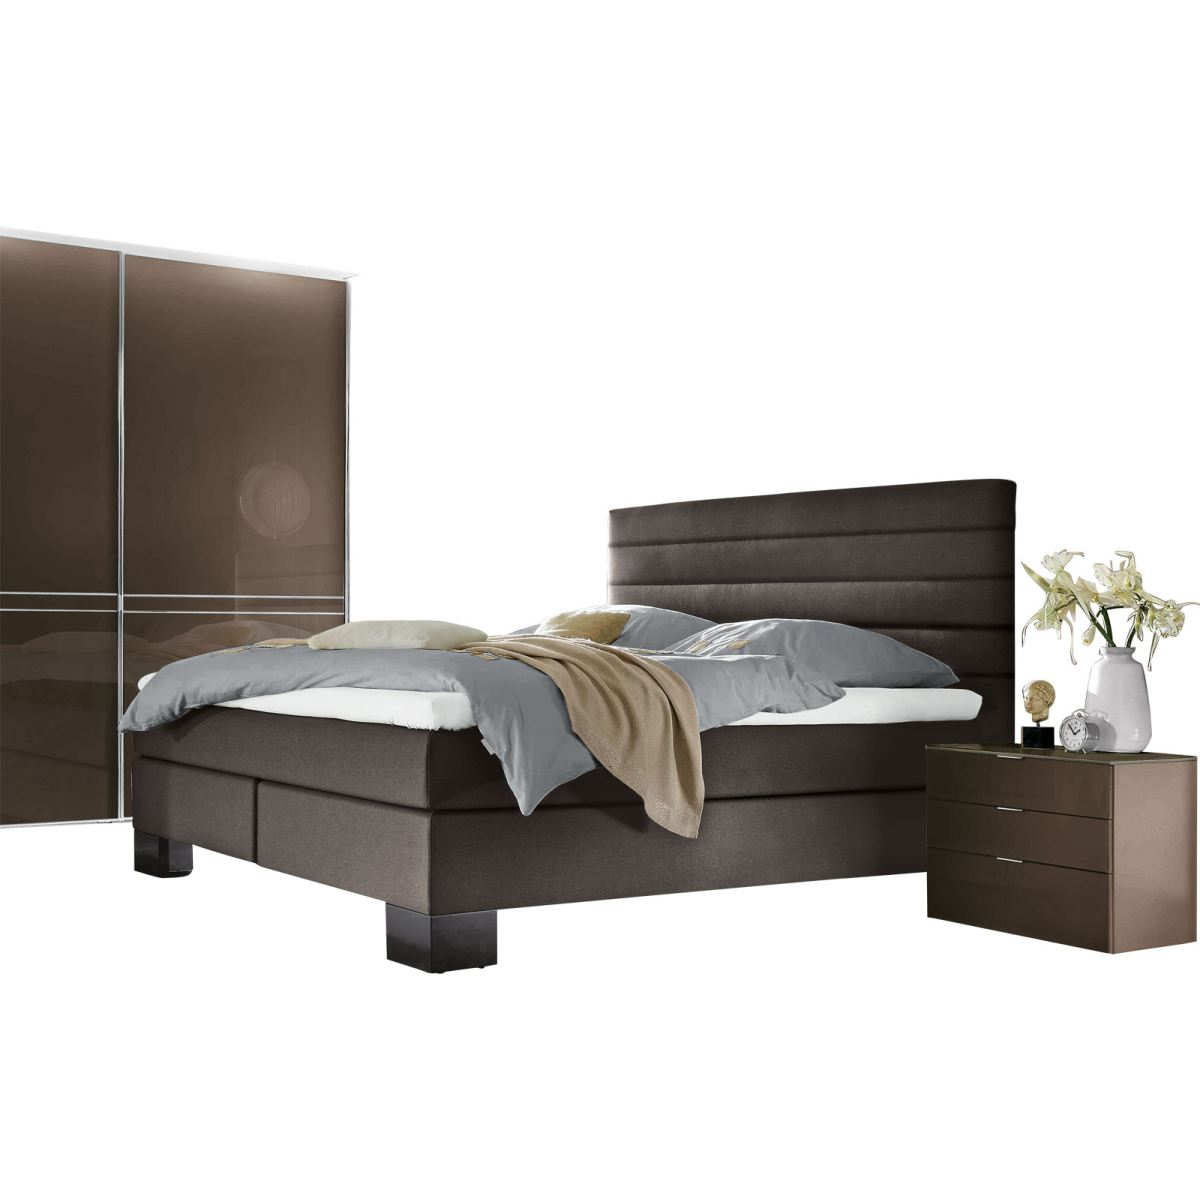 bett stoffbezug anthrazit porta m bel online kaufen. Black Bedroom Furniture Sets. Home Design Ideas